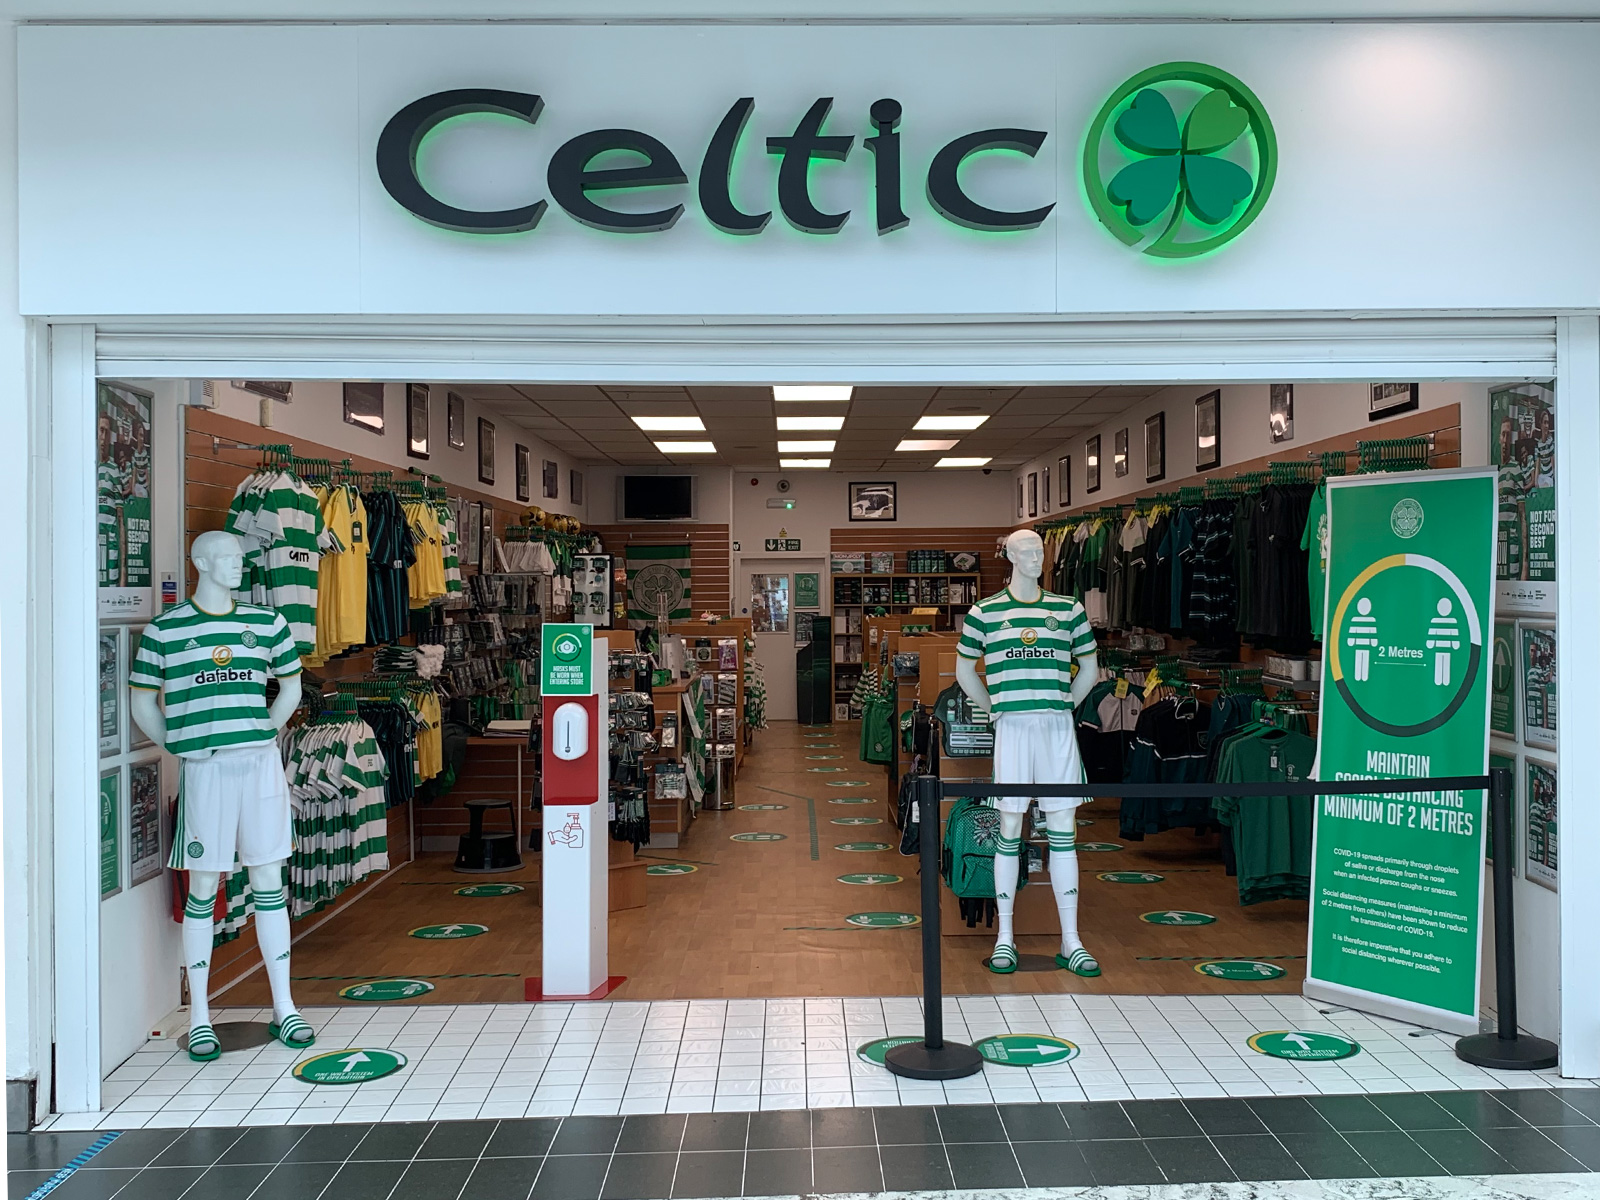 Celtic FC Clydebank